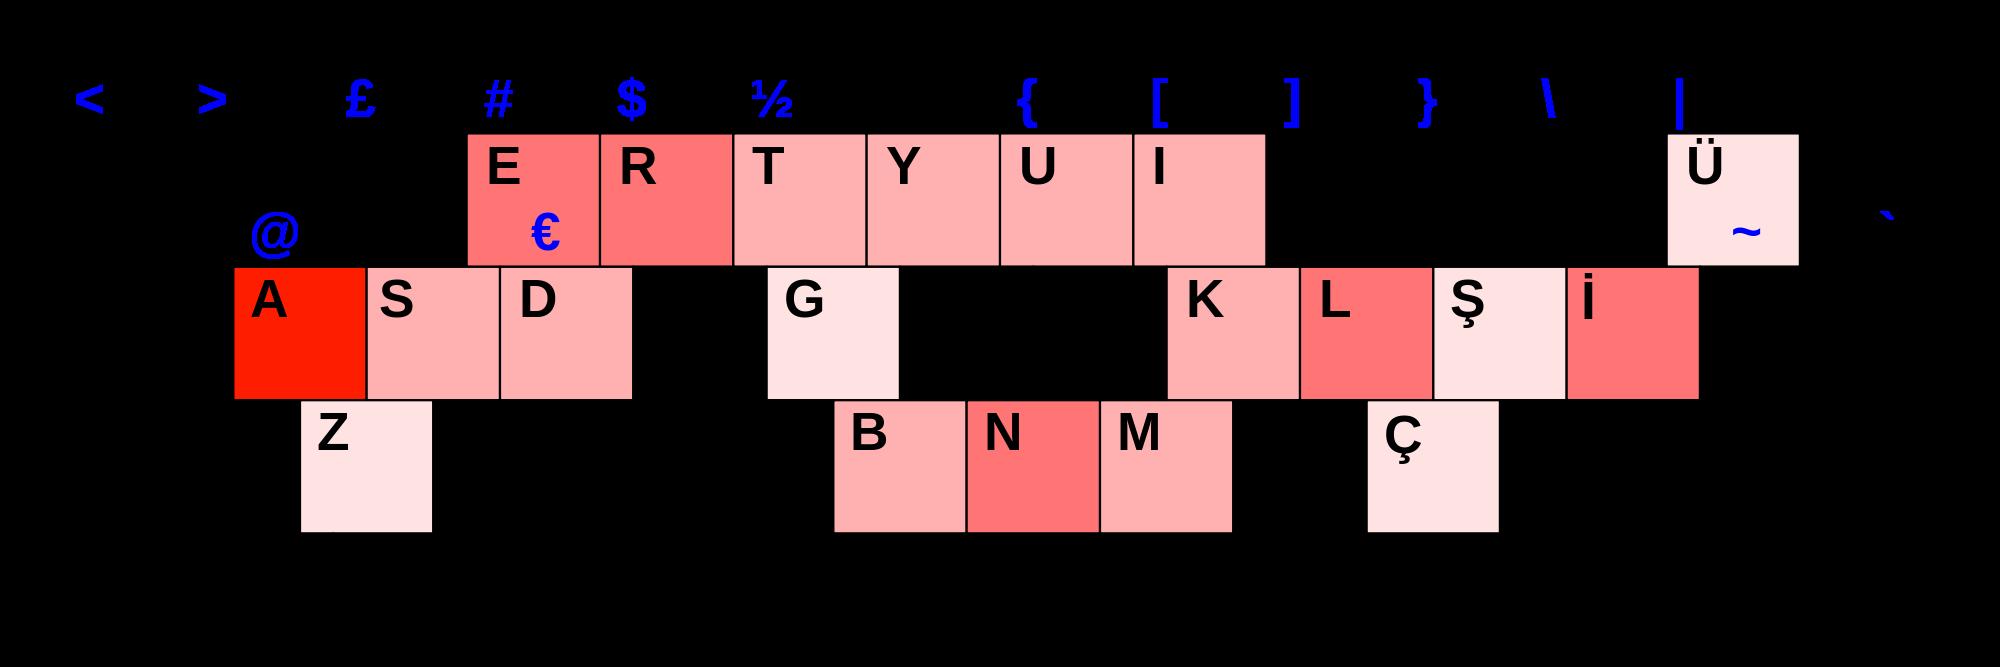 f kalvye harf yerleşimi